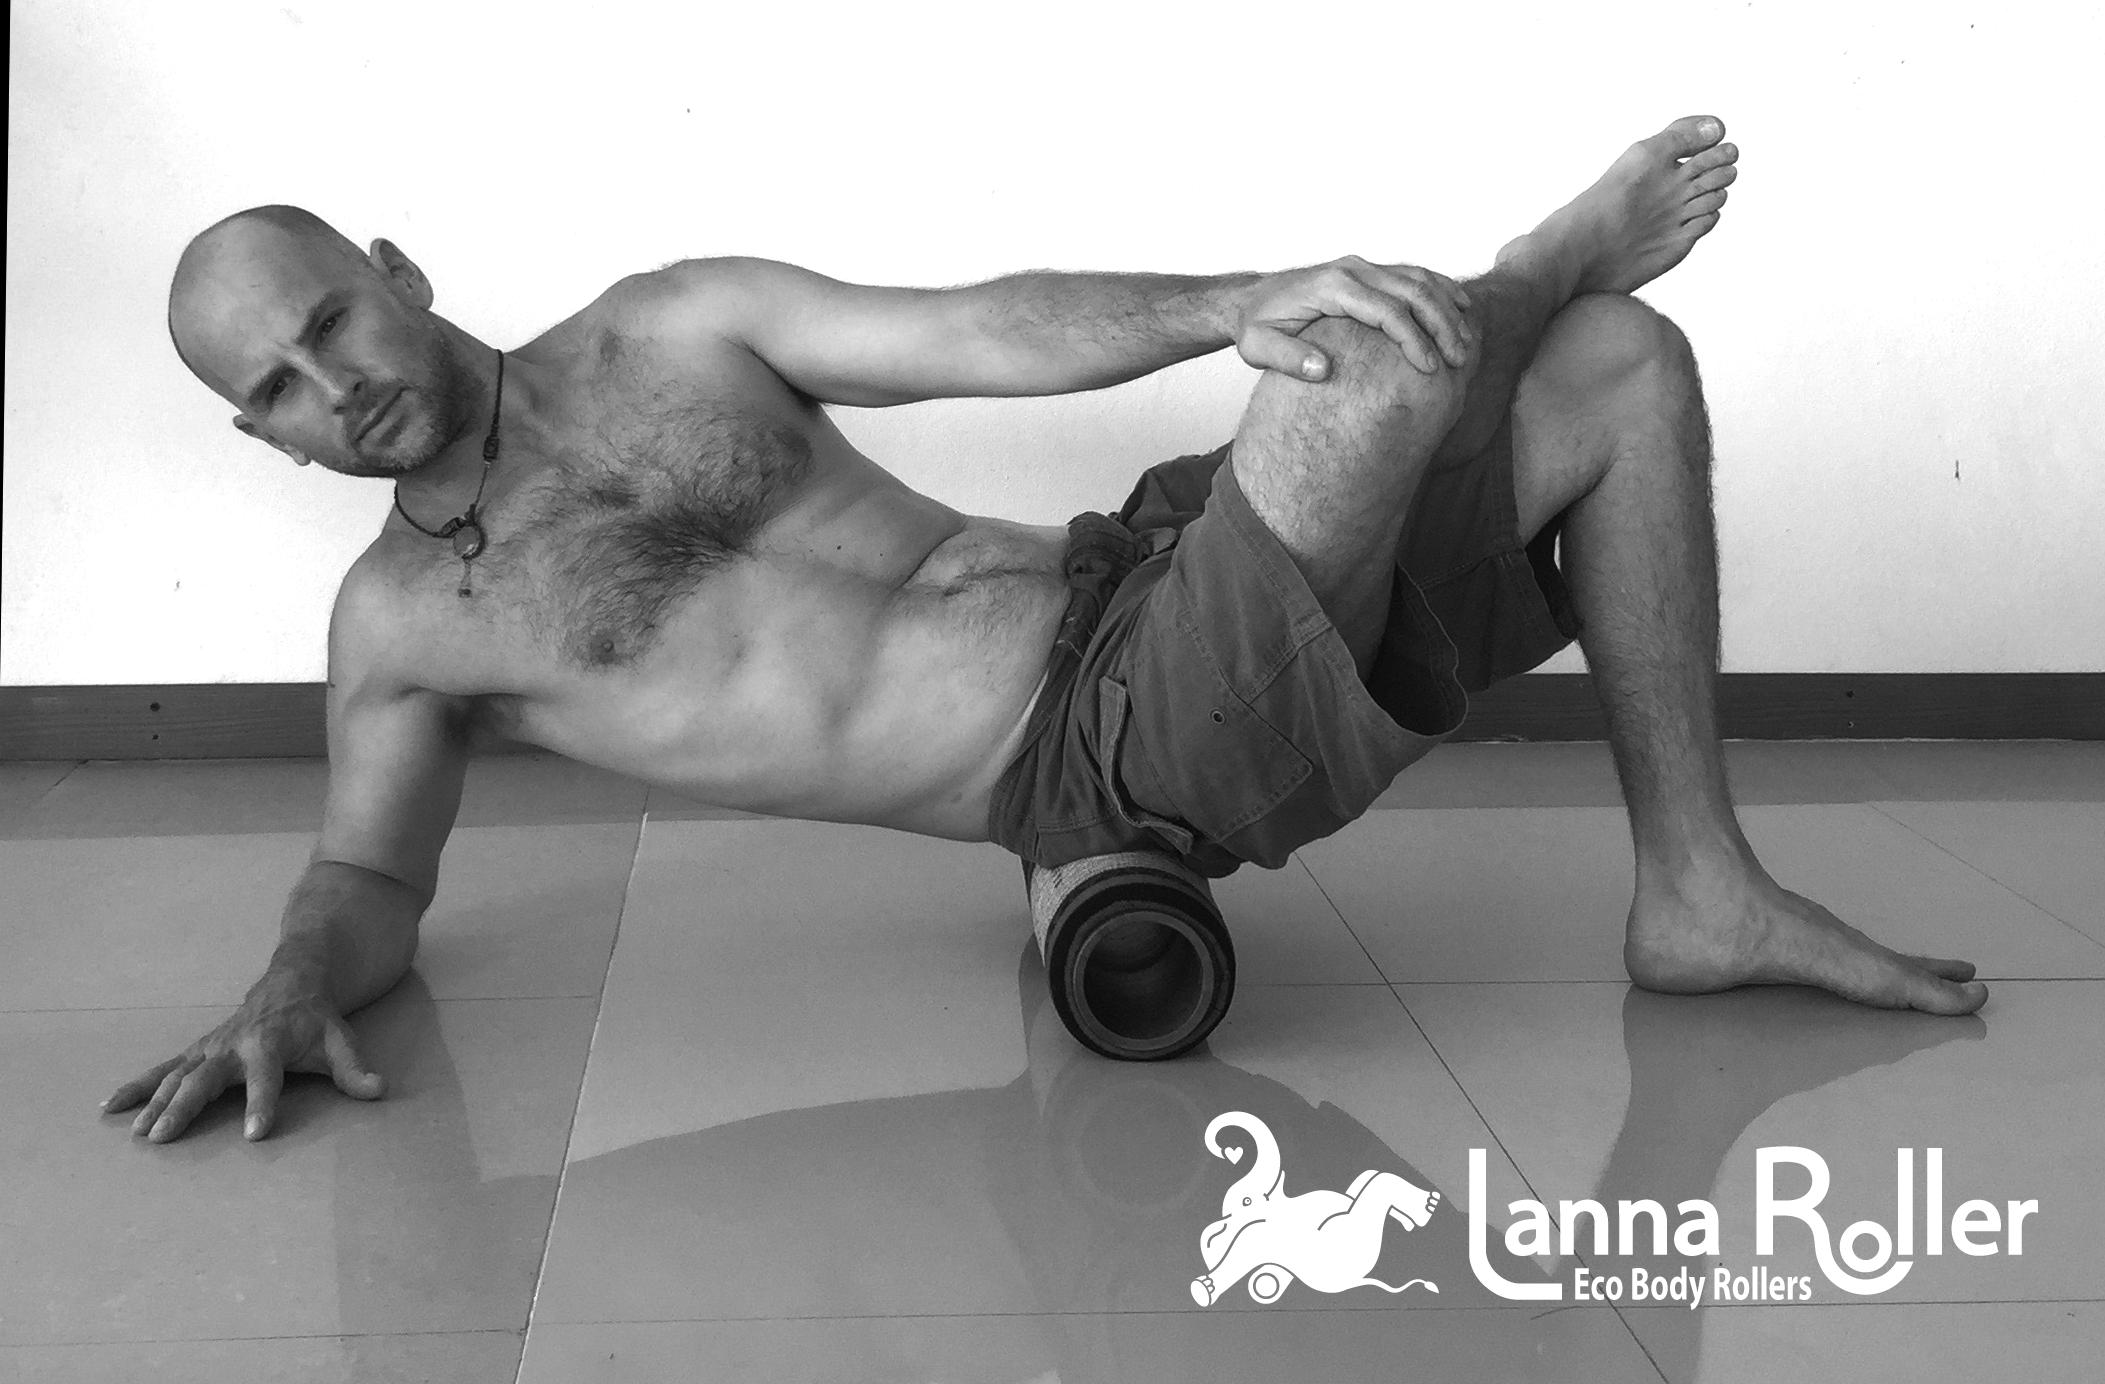 Lanna-Roller-Natural-Foam-Roller-glute-exercise